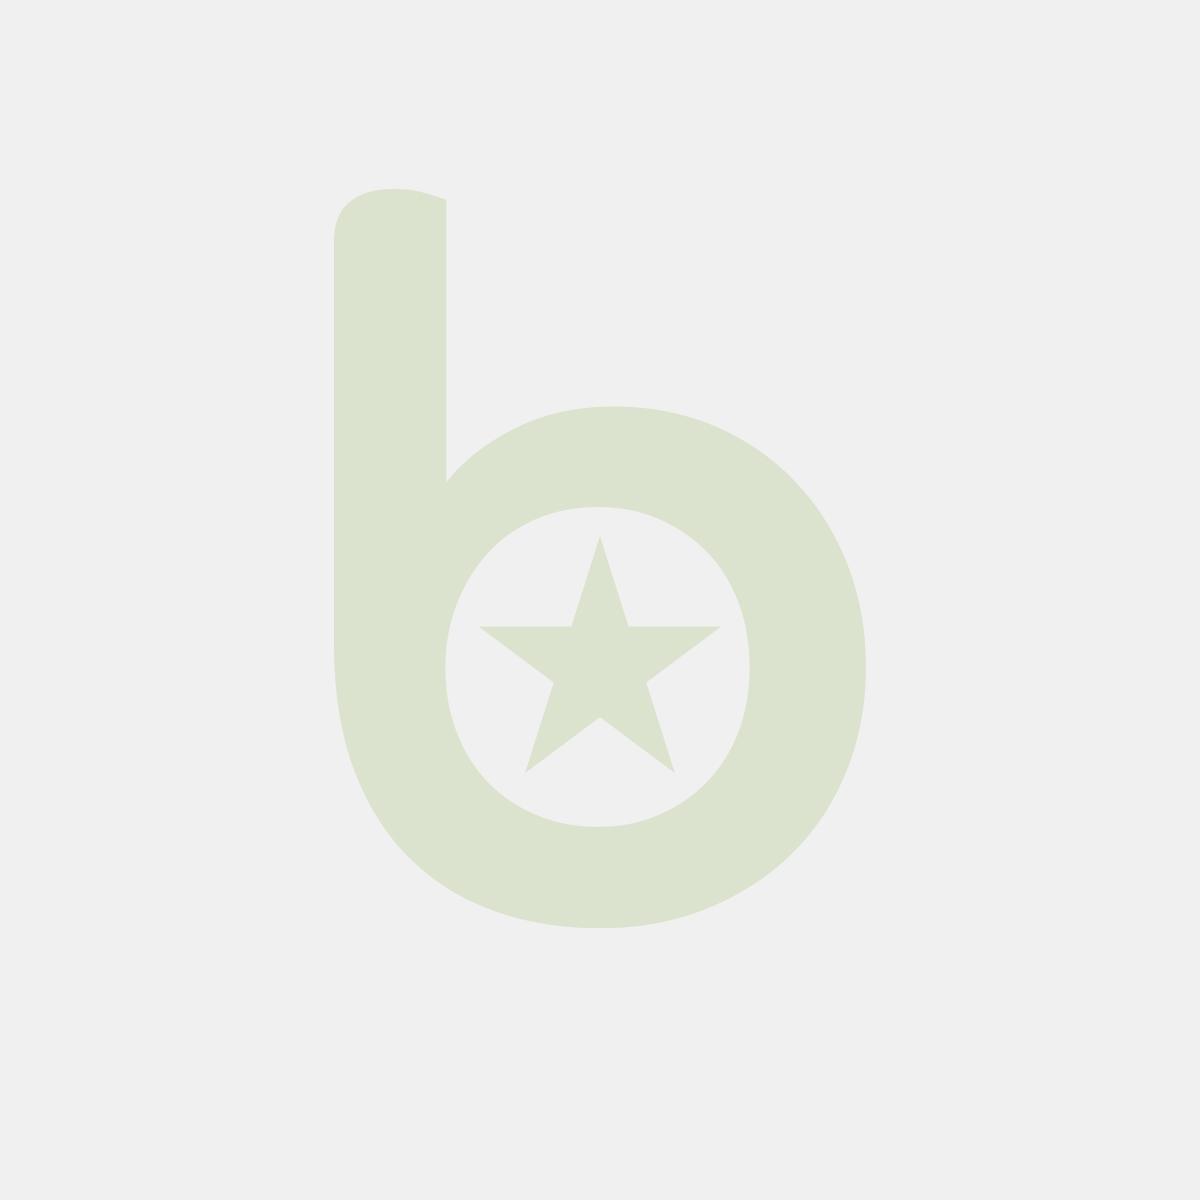 Bieżnik PAPSTAR ROYAL Collection w rolce 24m/40cm terakota, bibuła